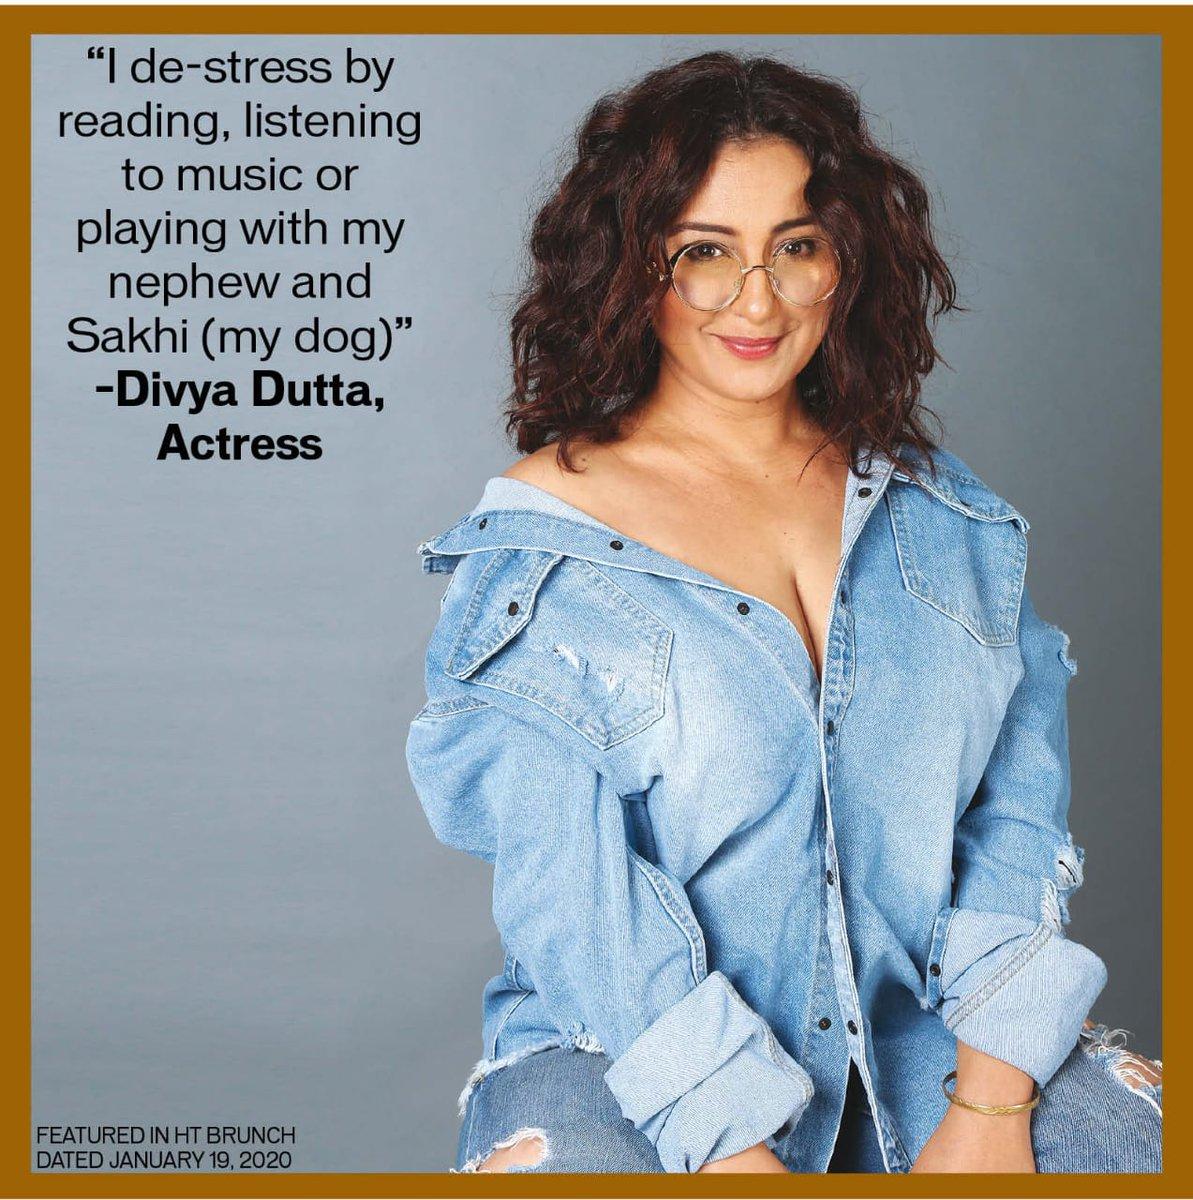 National-Award winning actress Divya Dutta reveals her de-stress mantra @divyadutta25 #personalagenda #bollywood #actors #bollywoodactresses #actresseswelove #nationalaward #nationalawardwinner #divyaduttapic.twitter.com/NAdPtbRbQB